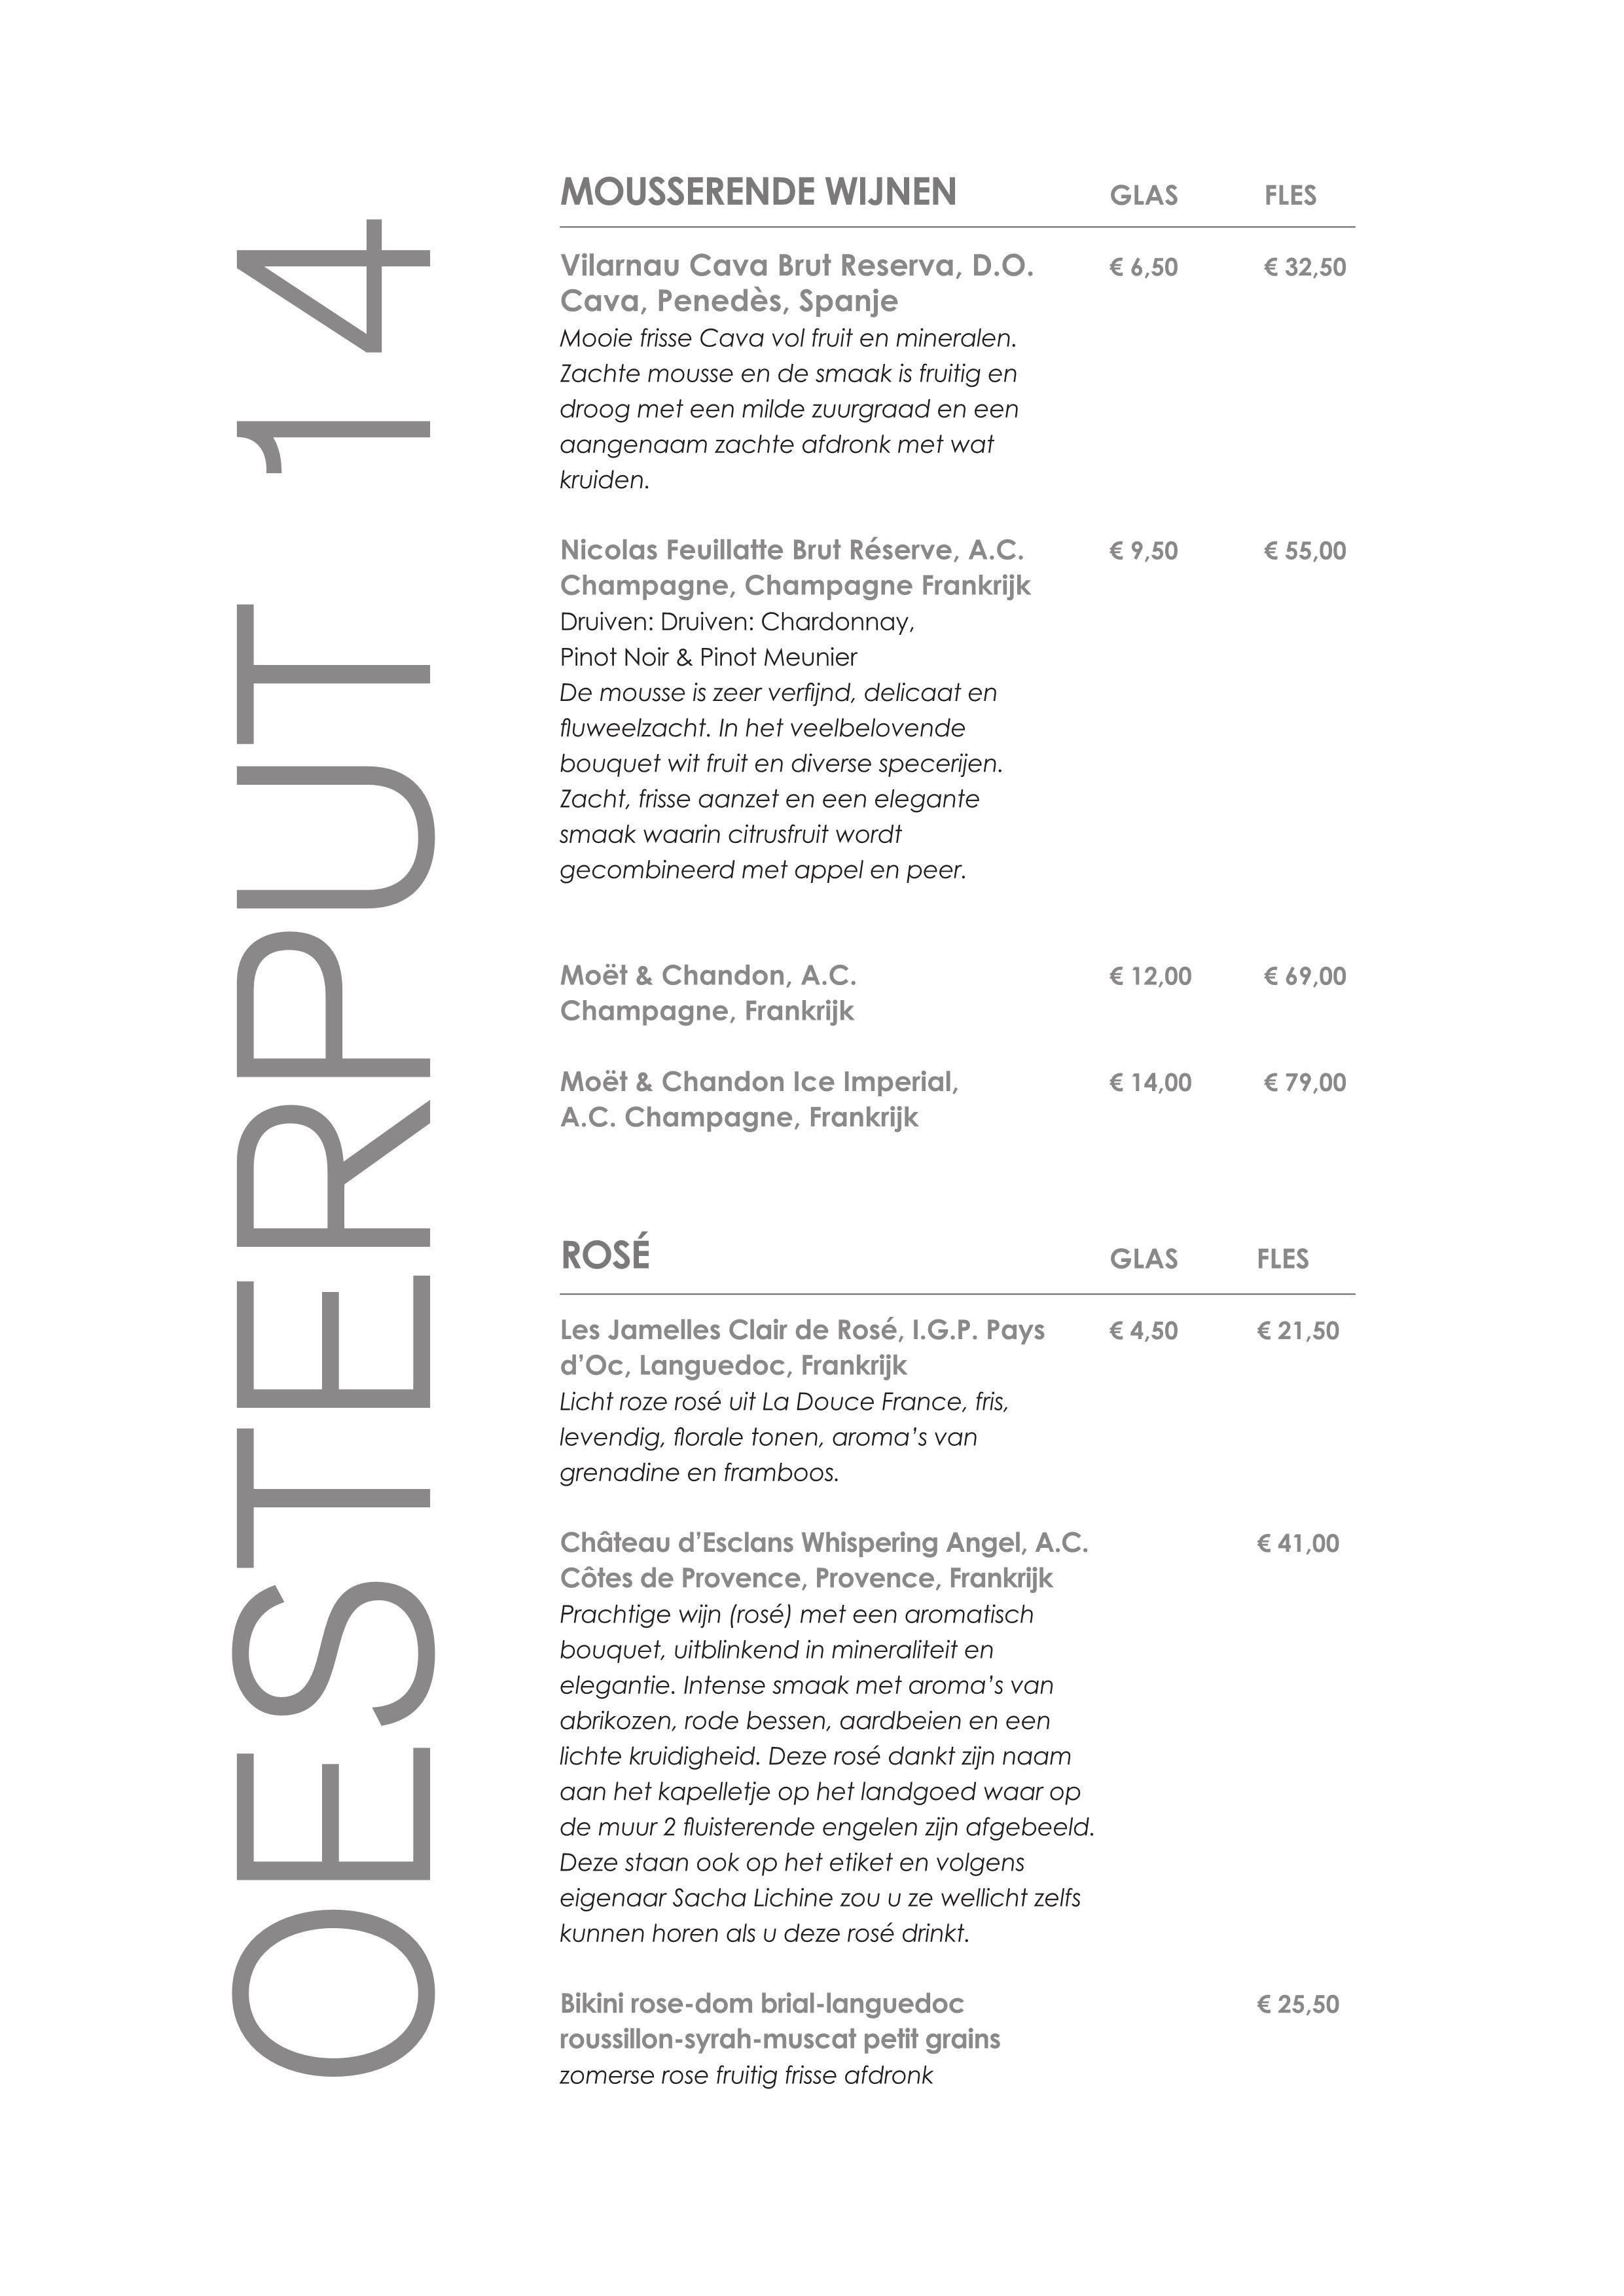 wijnkaart - oesterput14.page1